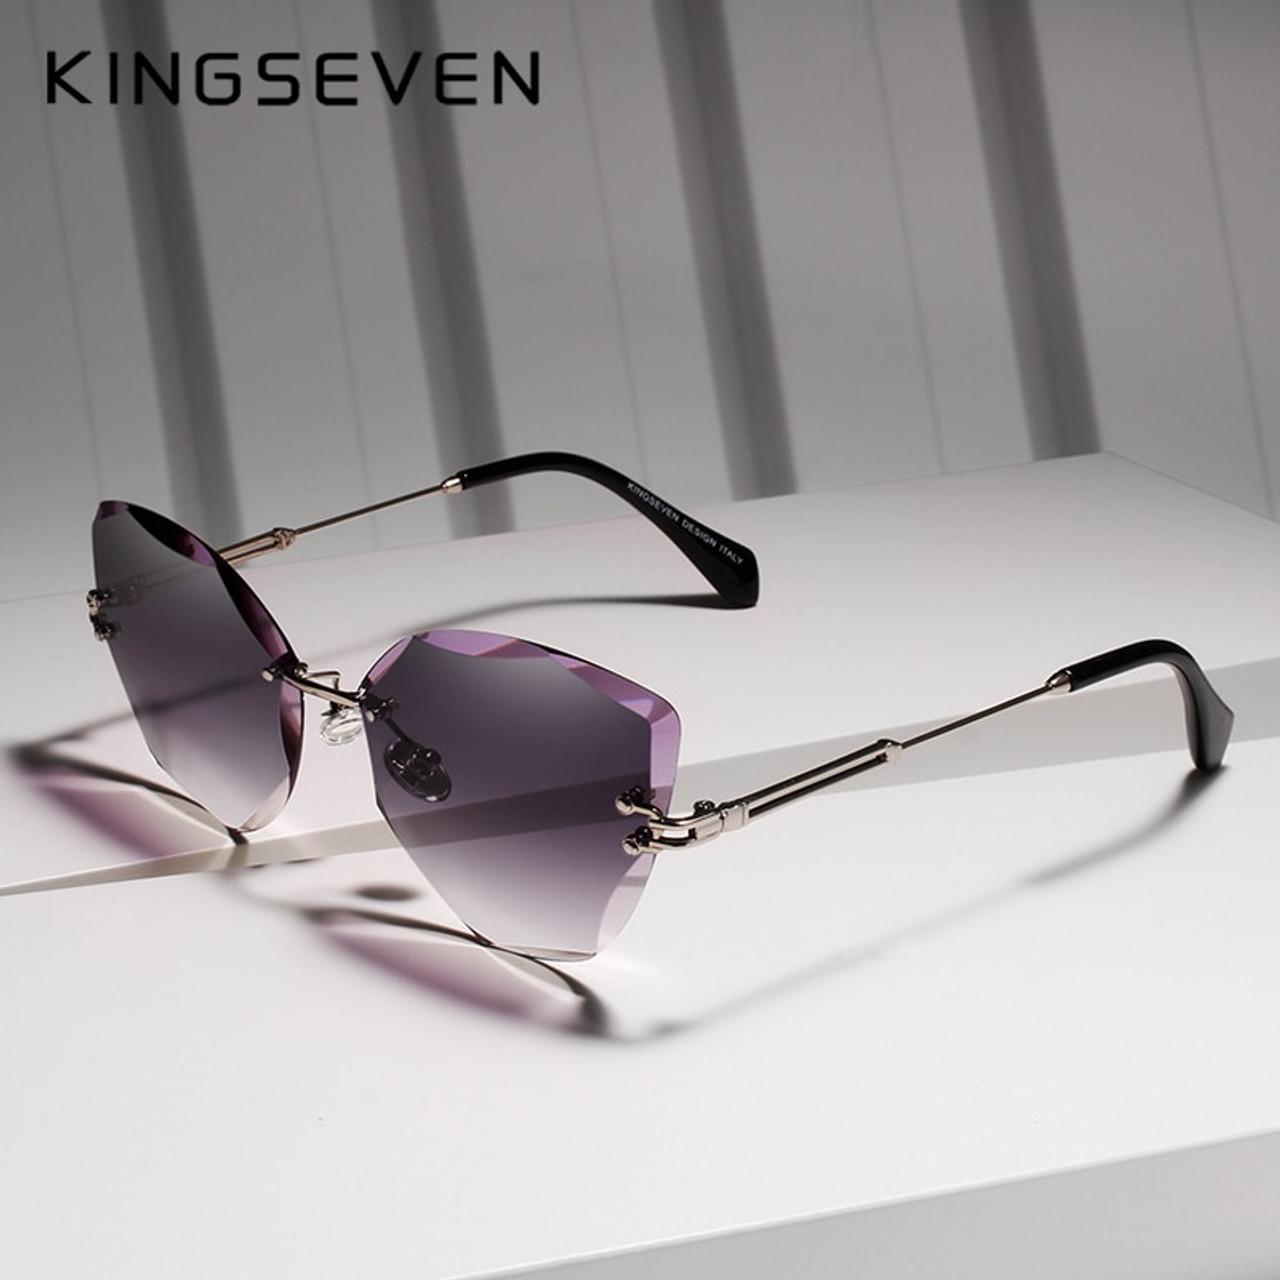 101b3c96dd47c KINGSEVEN DESIGN Fashion Lady Sun glasses 2019 Rimless Women Sunglasses  Vintage Alloy Frame Classic Brand Designer ...